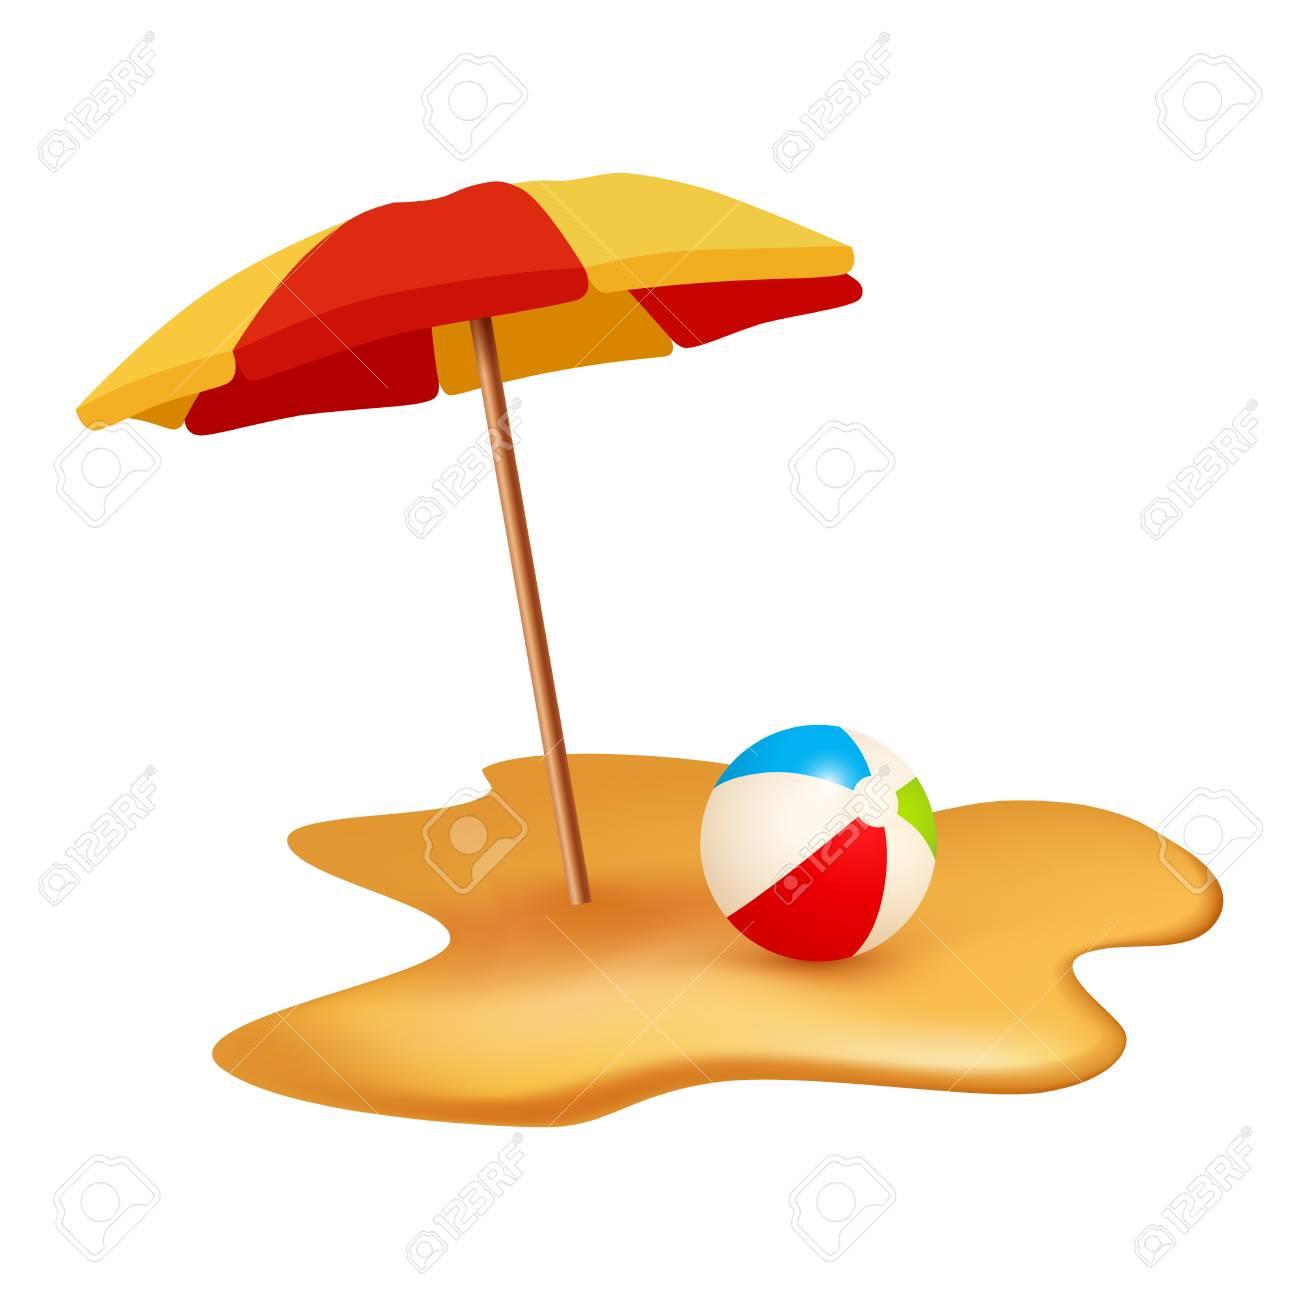 Summer Holidays Objects Beach Ball And Umbrella Vector